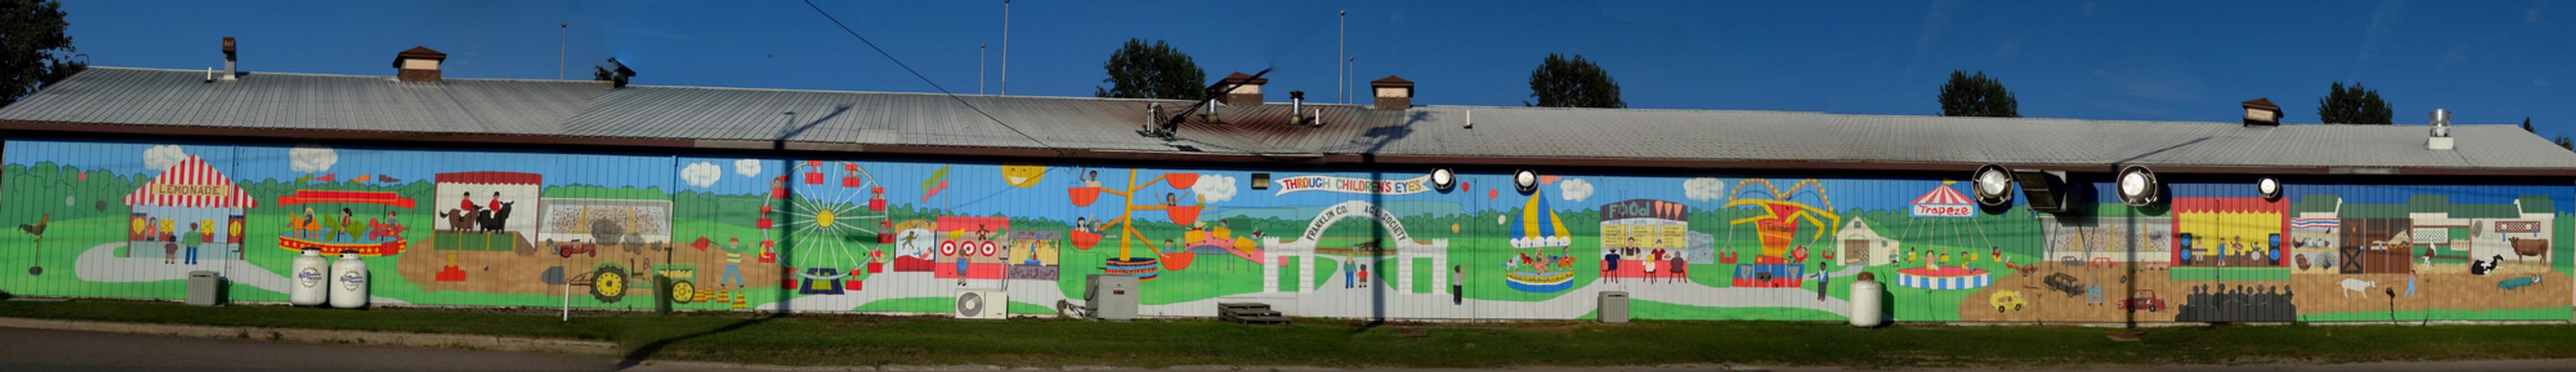 Malone Mural